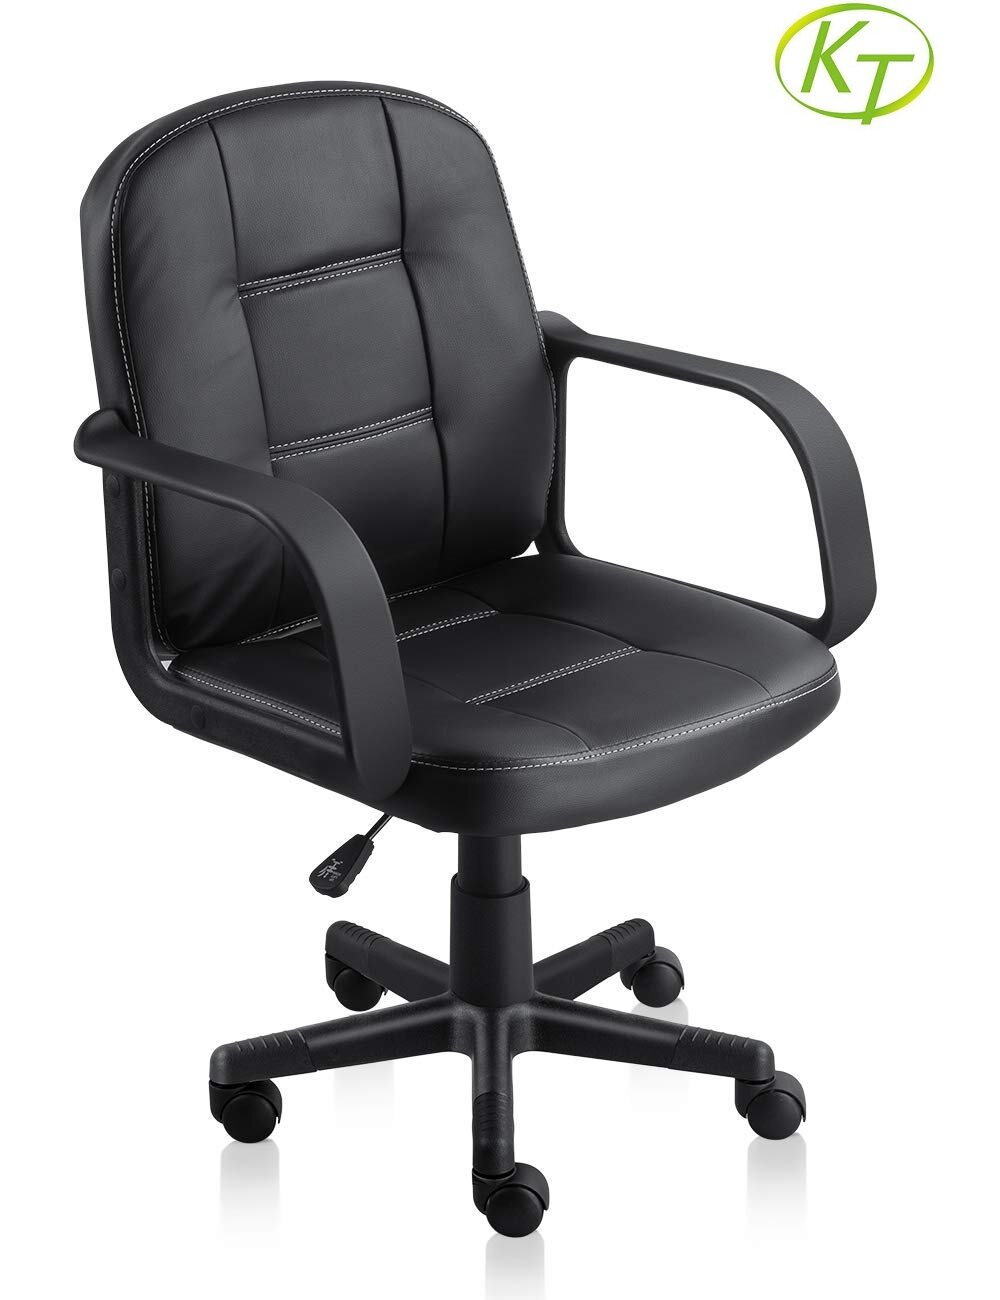 Black Swivel Bar Stools With Backs Heavy Duty Office Chairs KT-OC6178